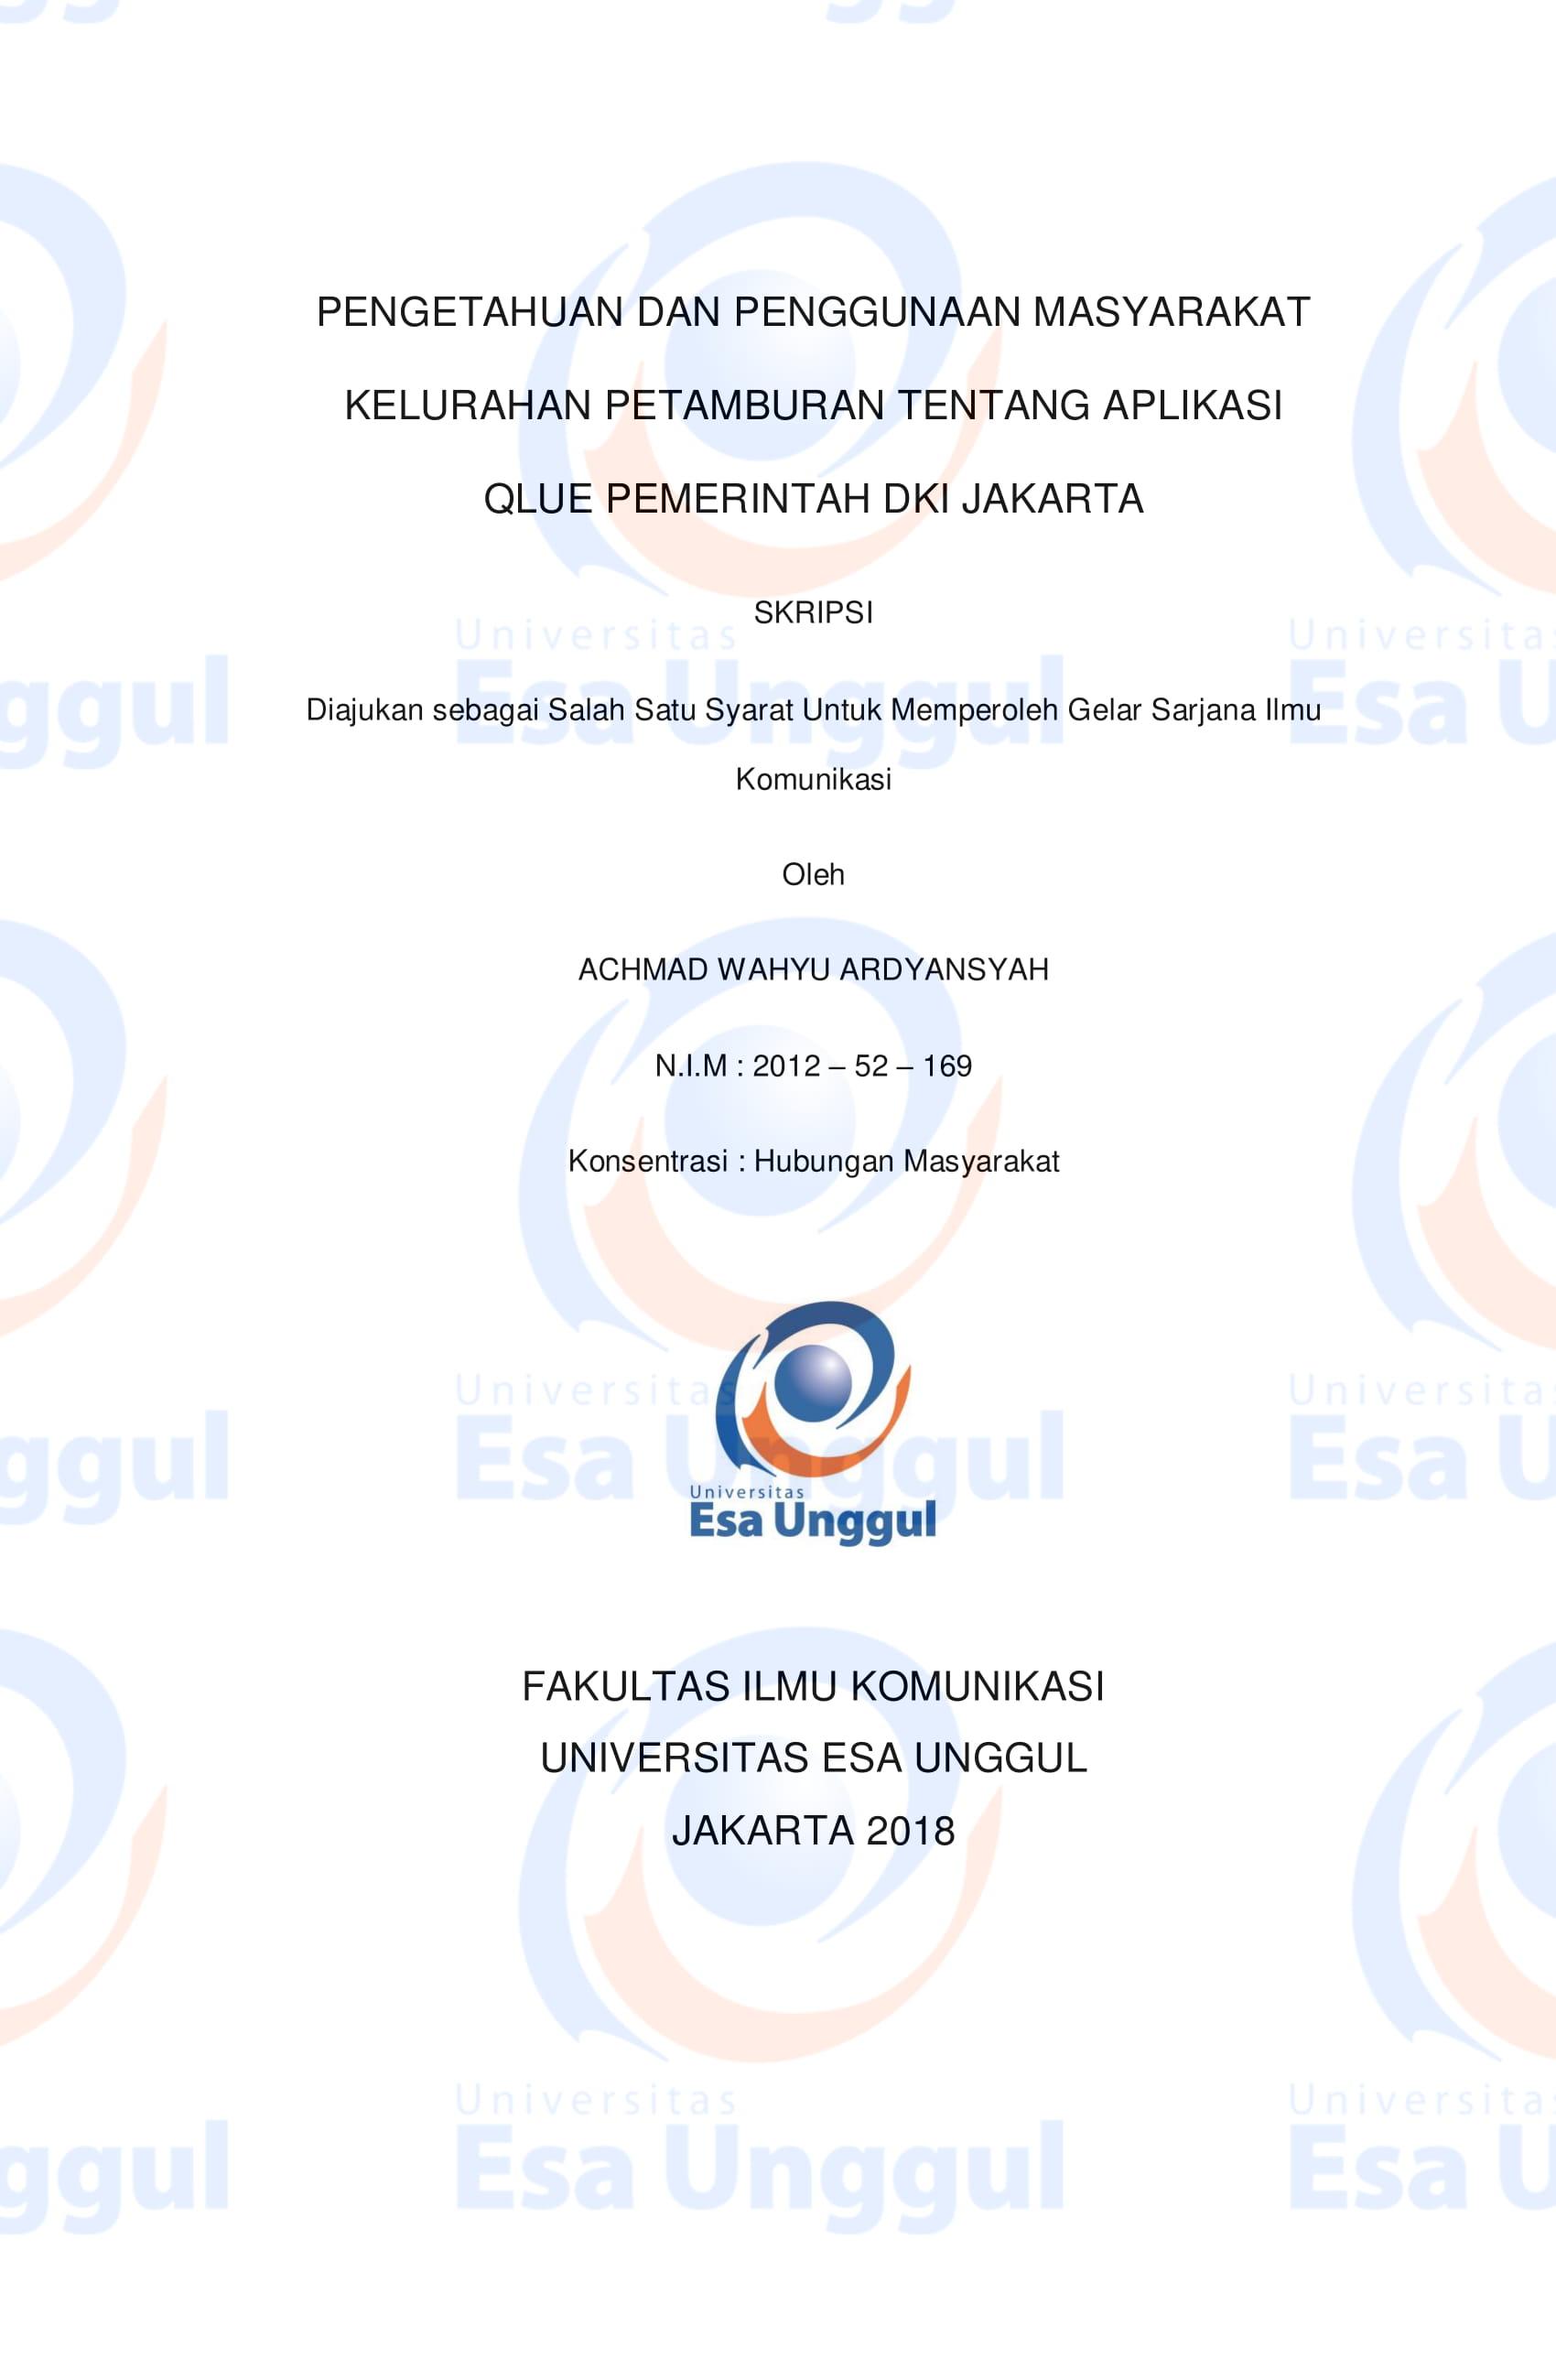 Pengetahuan dan Penggunaan Masyarakat Kelurahan Petamburan Tentang Aplikasi Qlue Pemerintah DKI Jakarta